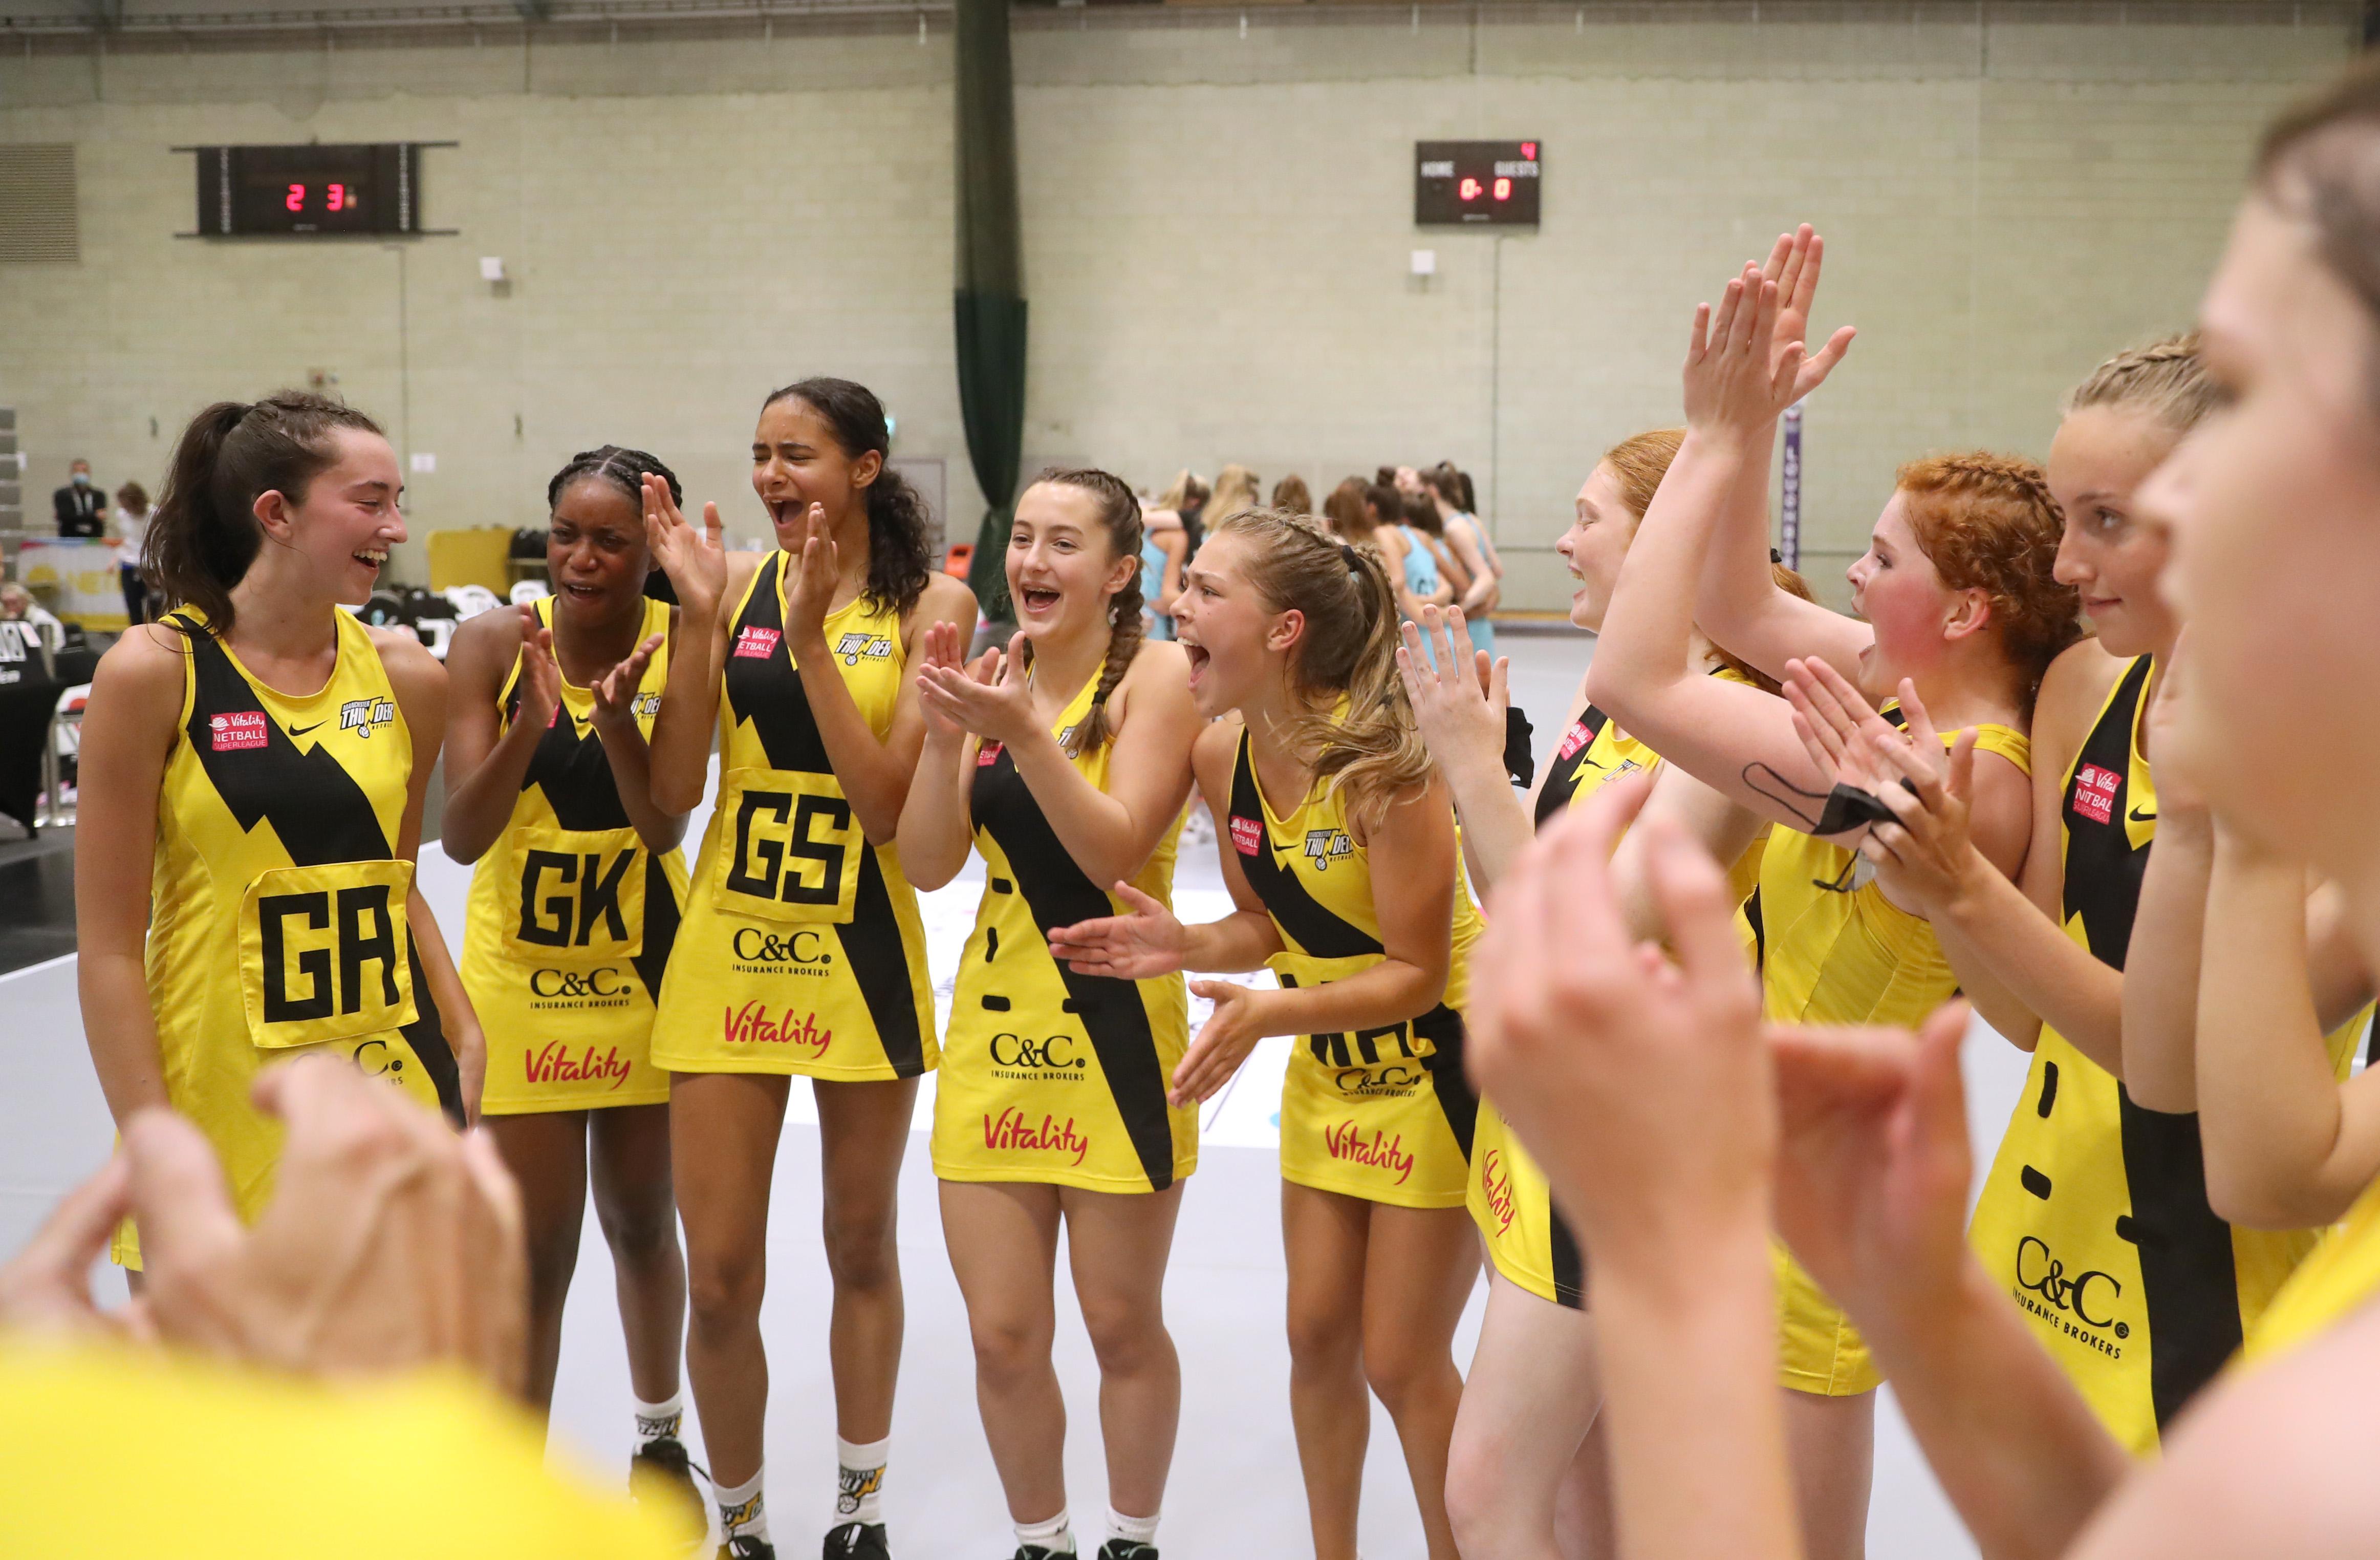 Manchester Thunder win thrilling 2021 School Games